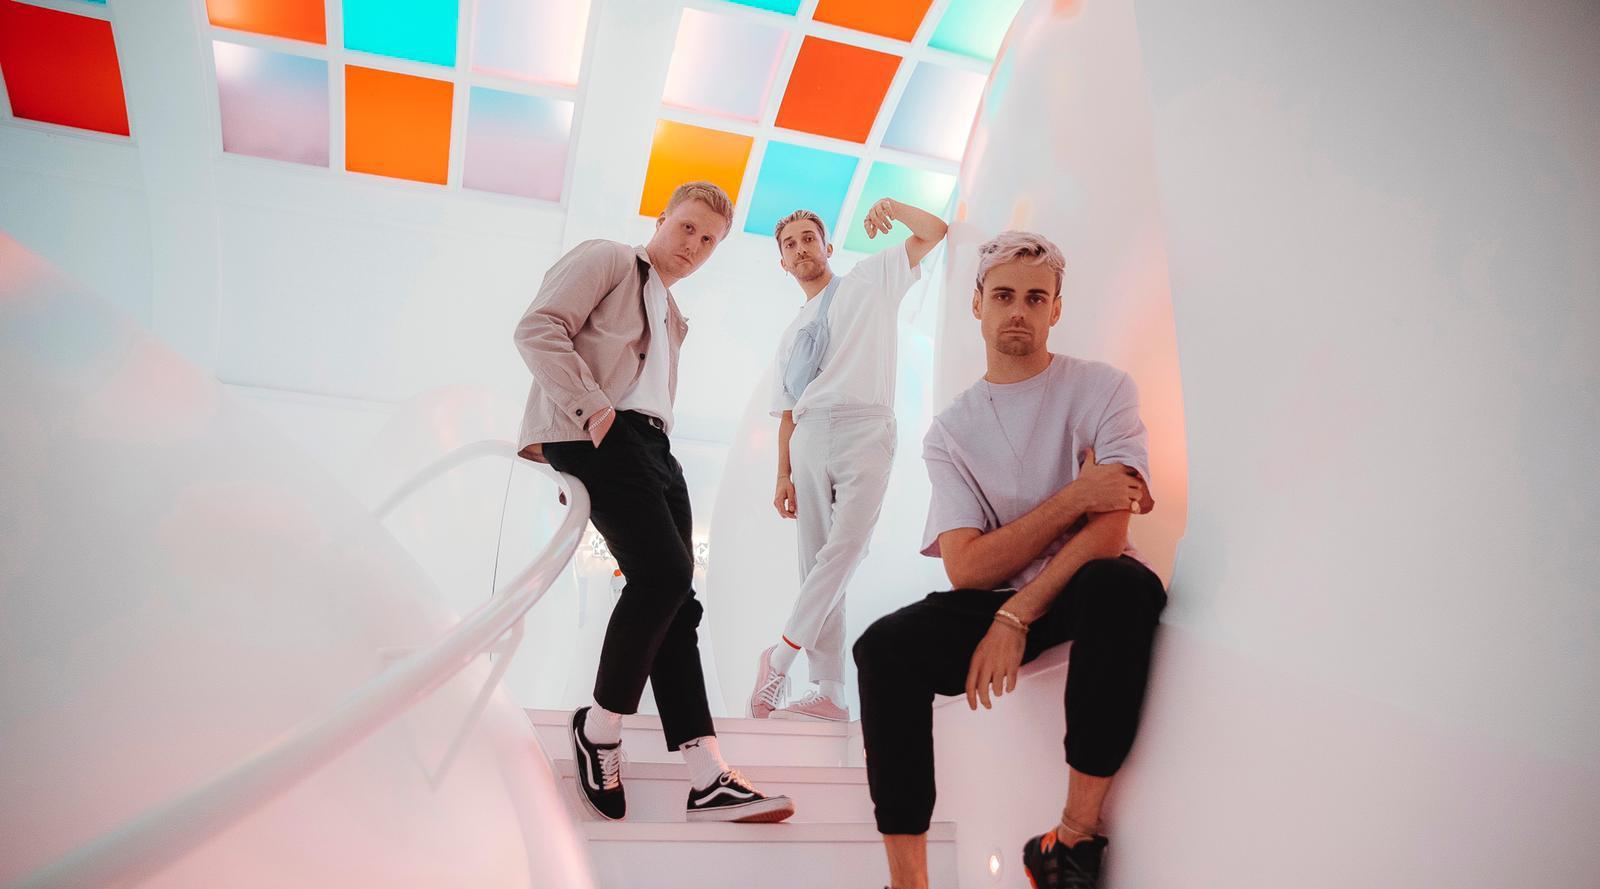 INTERVIEW: Scottish alt-pop band LIIMO discuss debut album 'Volume 01' 1